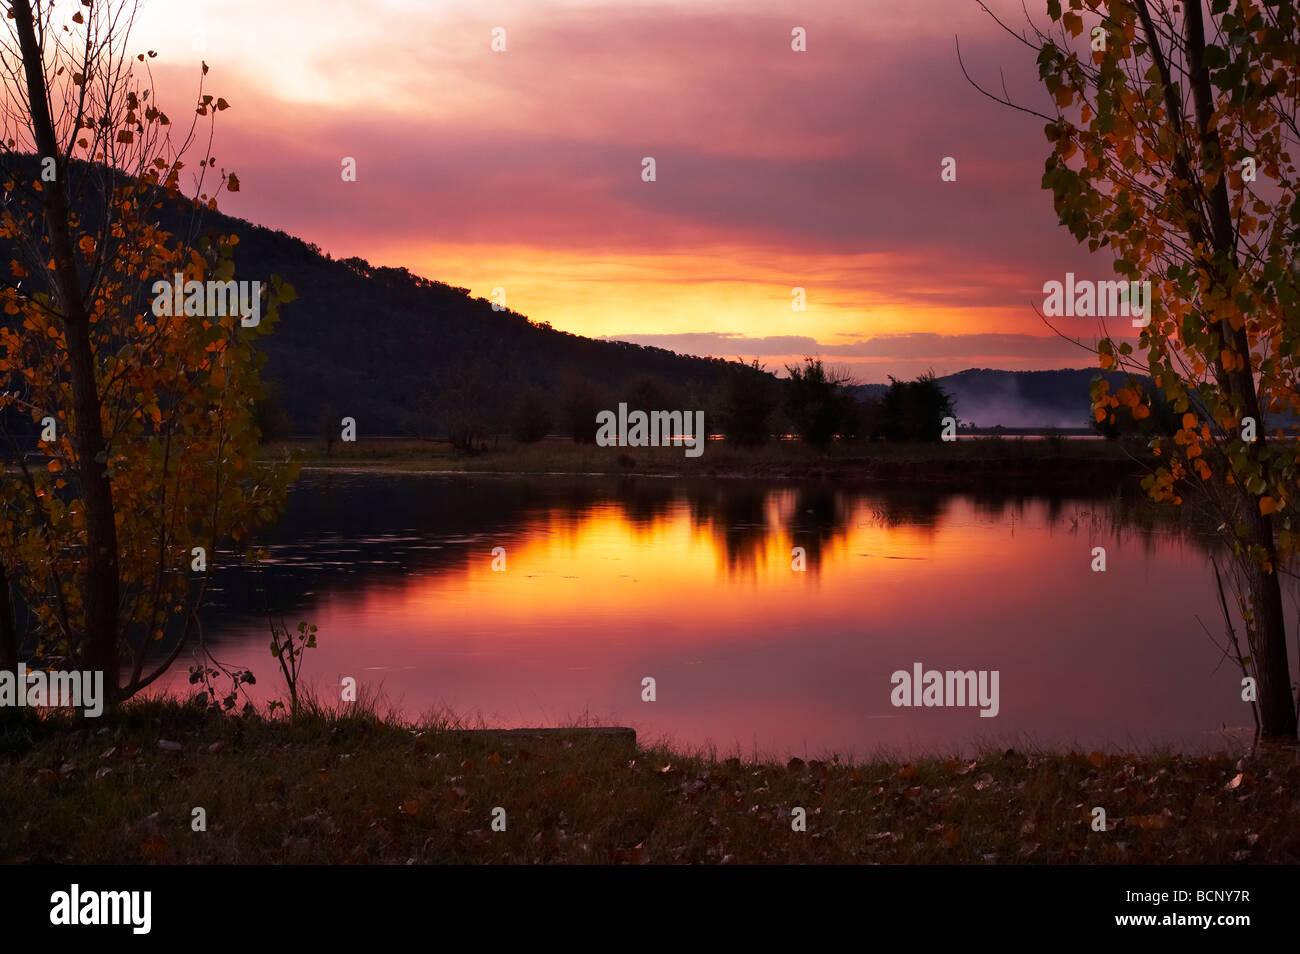 Sunset though Smoke from Burnoffs Khancoban Pondage Snowy Mountains Southern New South Wales Australia - Stock Image